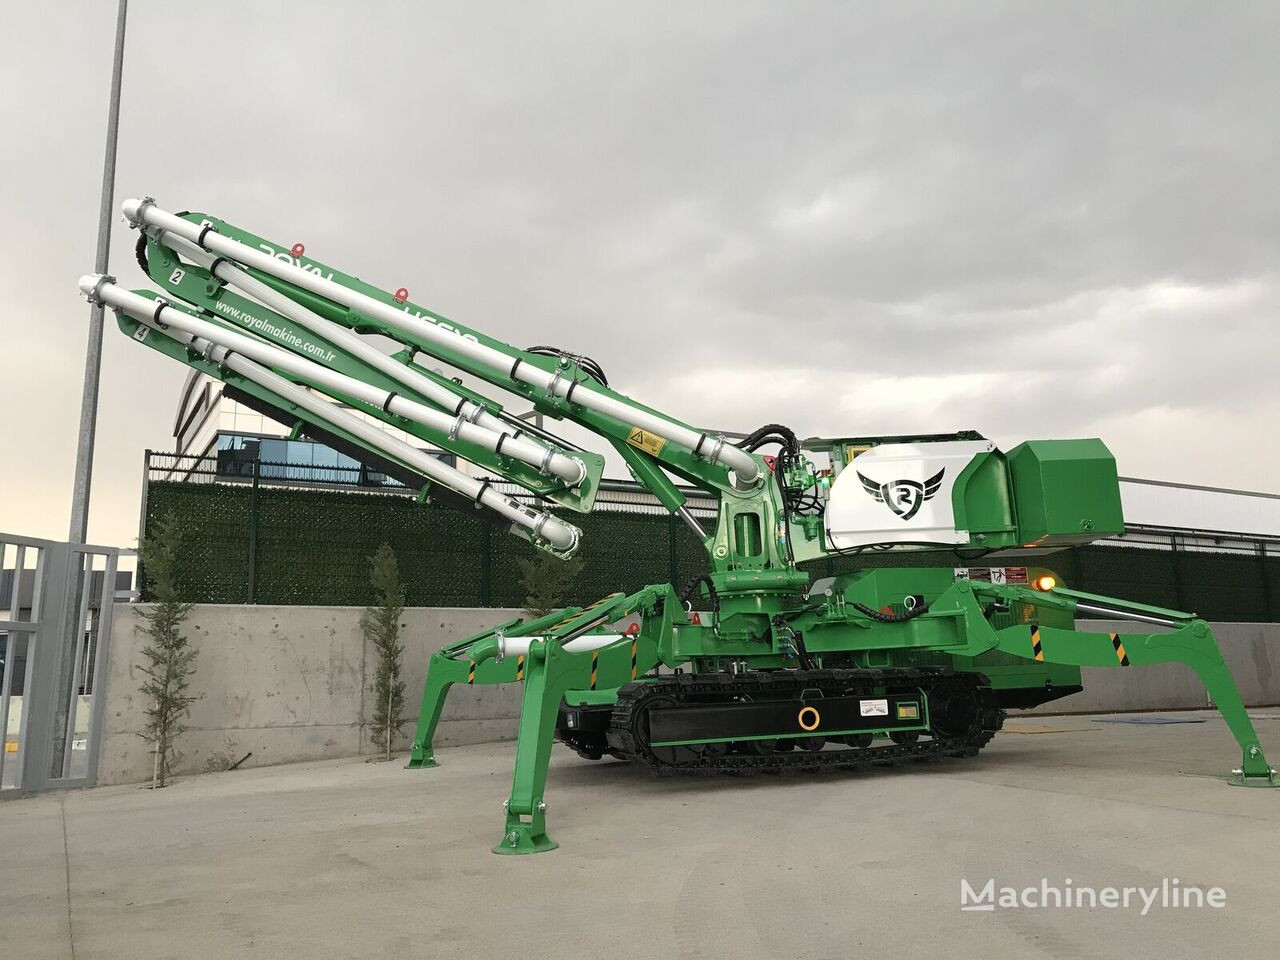 ny ROYALMAC HCS18 Z4 CRAWLER PLACING BOOM betong distribusjon pumpe